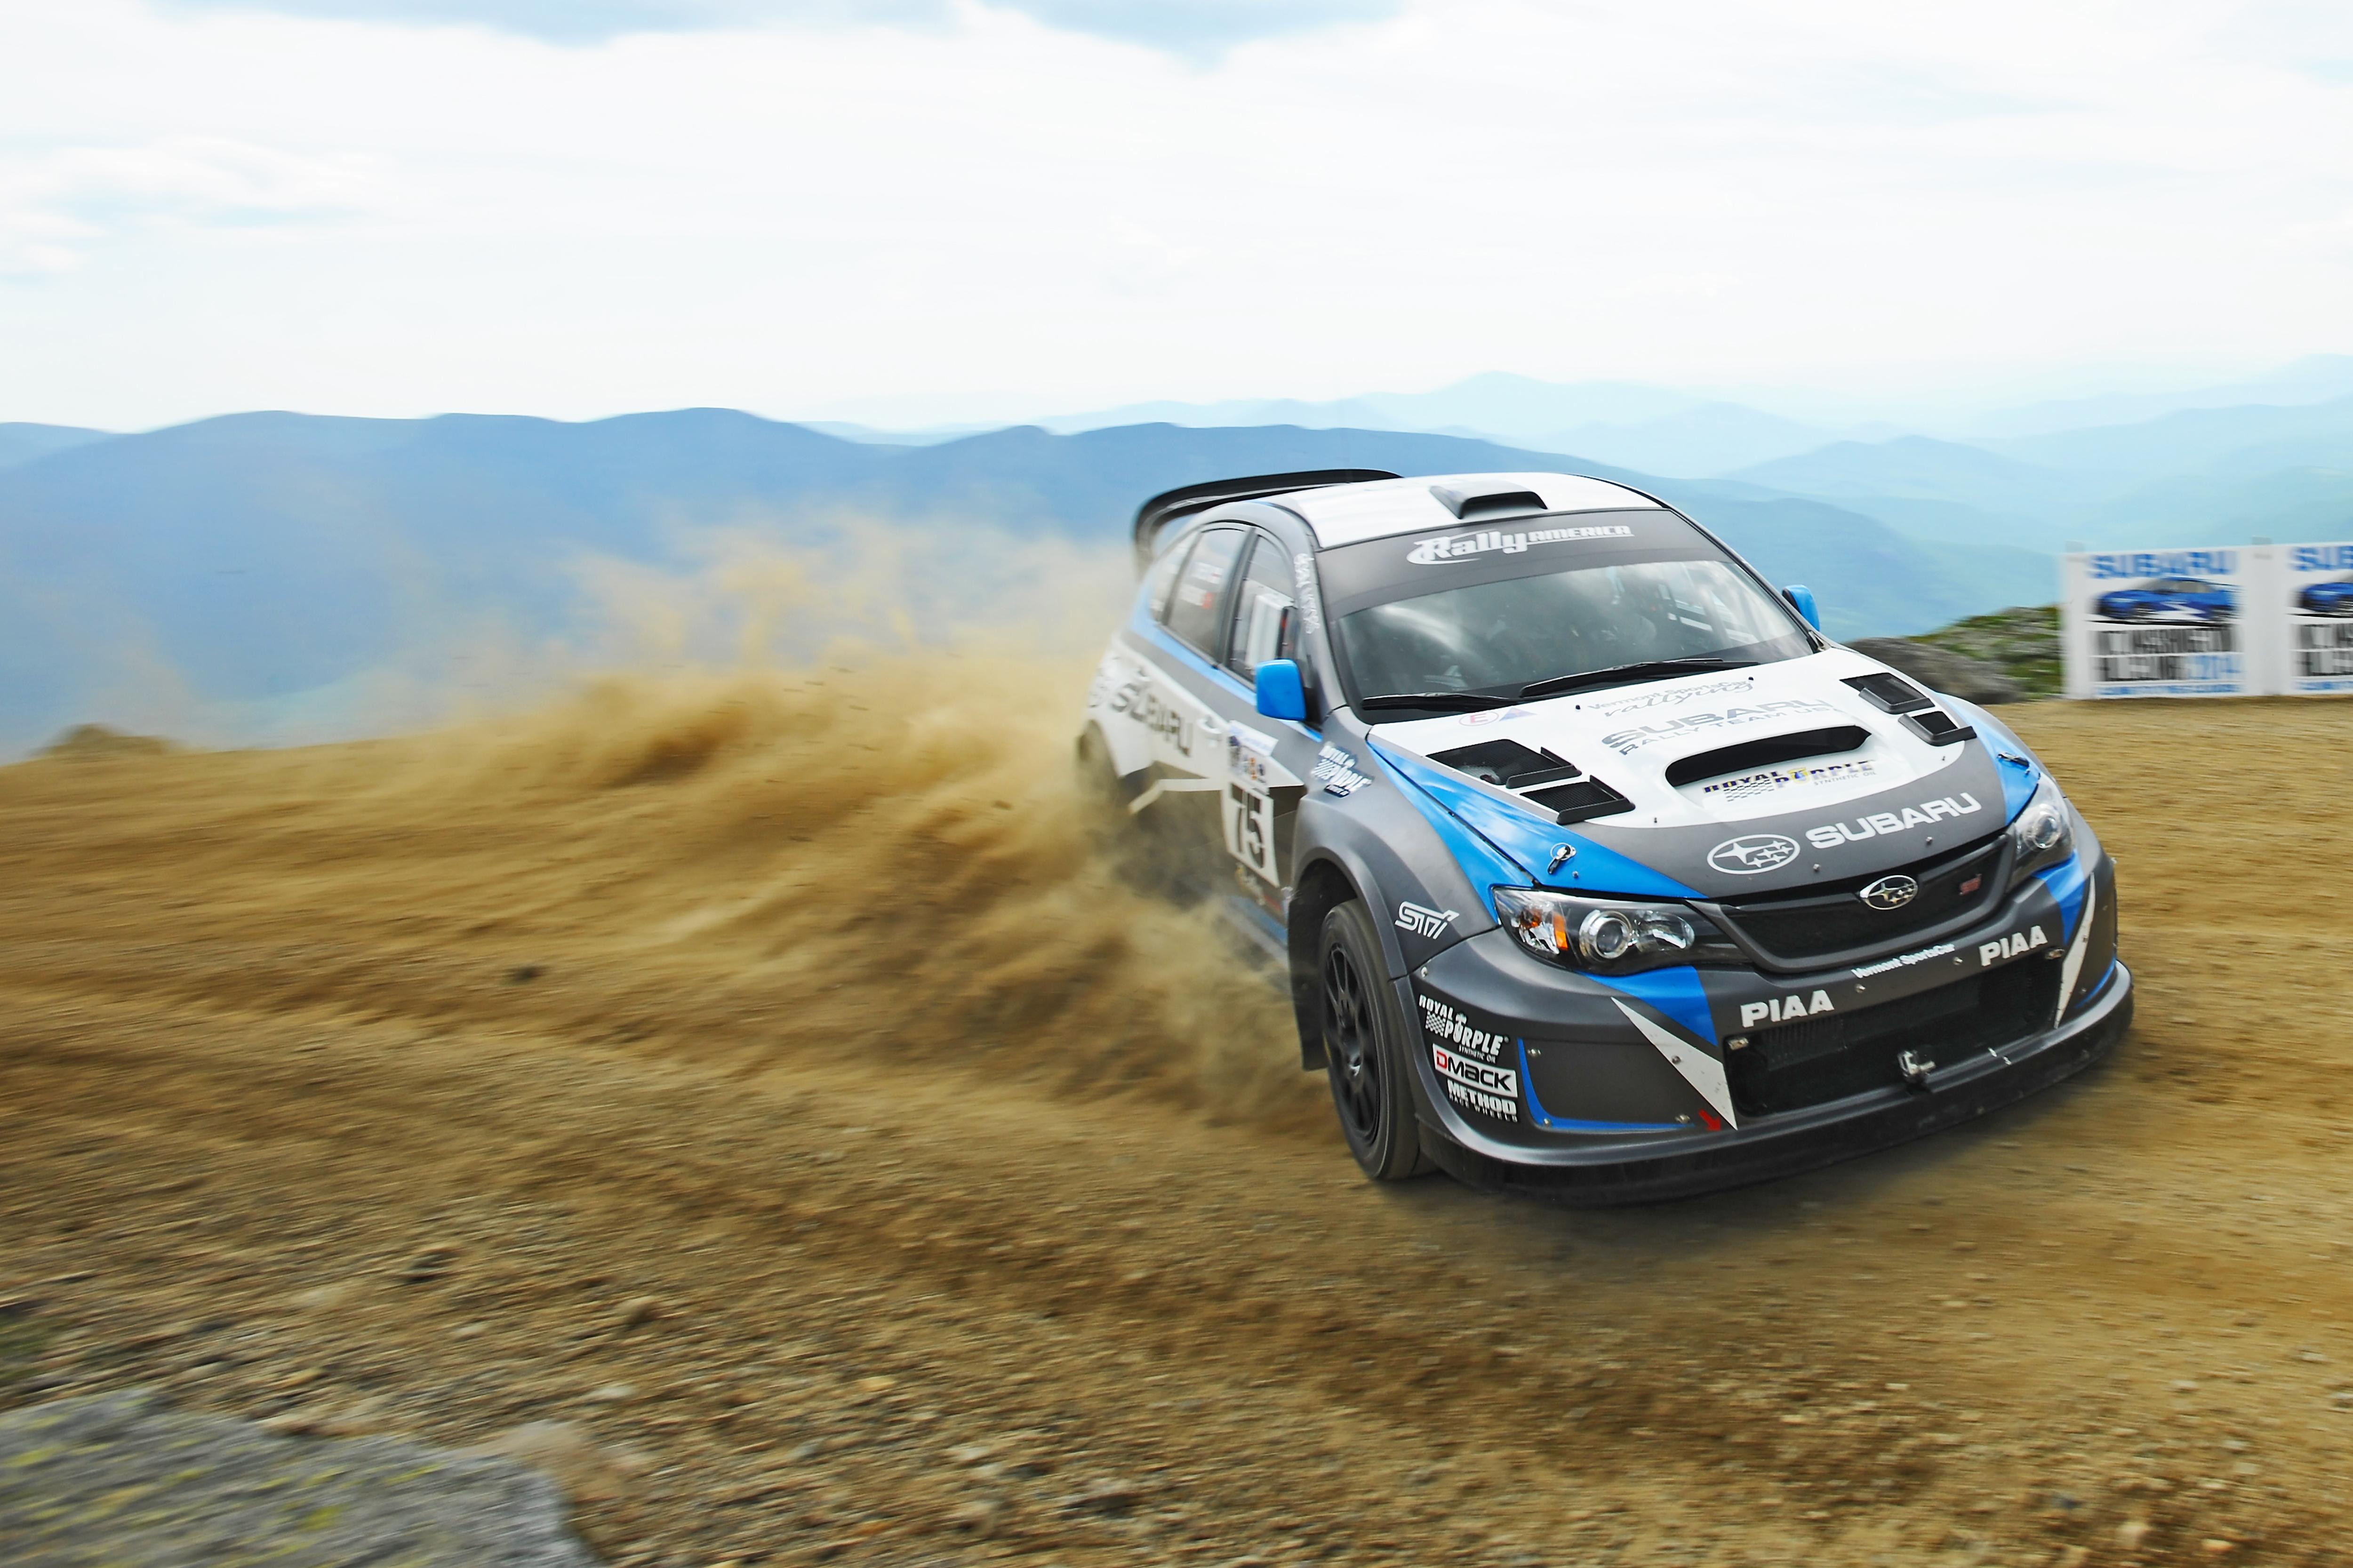 Subaru Motorsports App with 360 Tech - Build Race Party